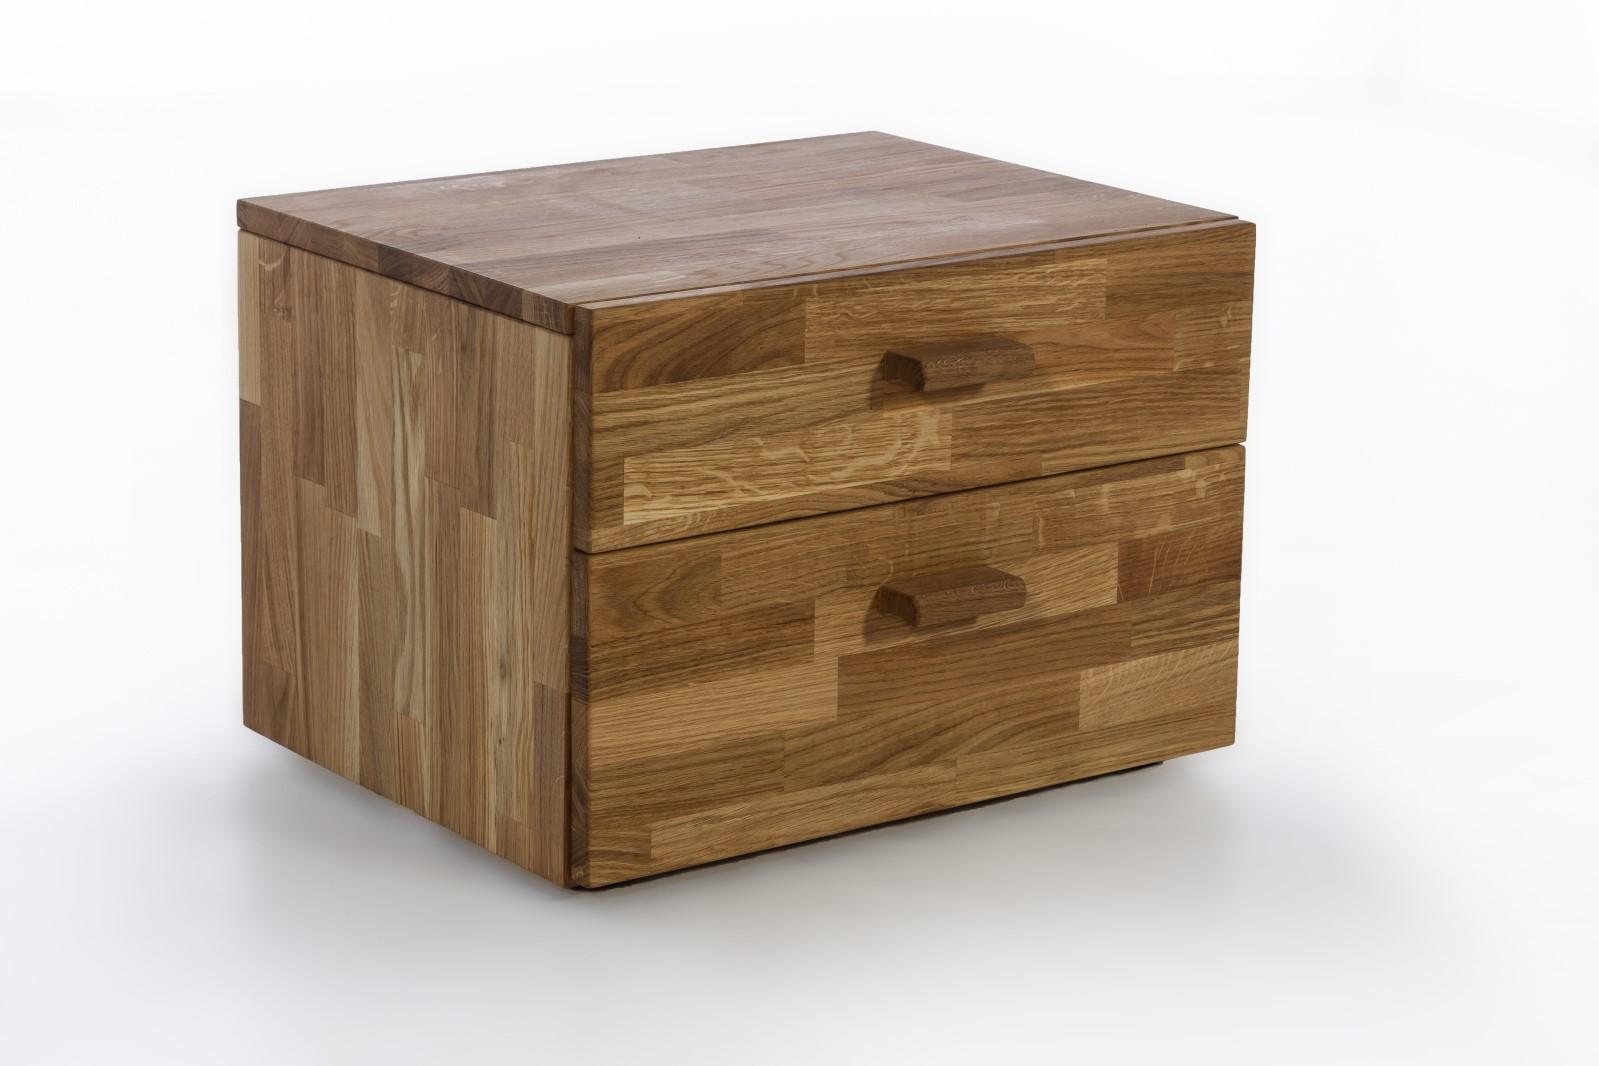 polsterbett bett doppelbett tagesbett arizona 140x200 cm antik wei ebay. Black Bedroom Furniture Sets. Home Design Ideas